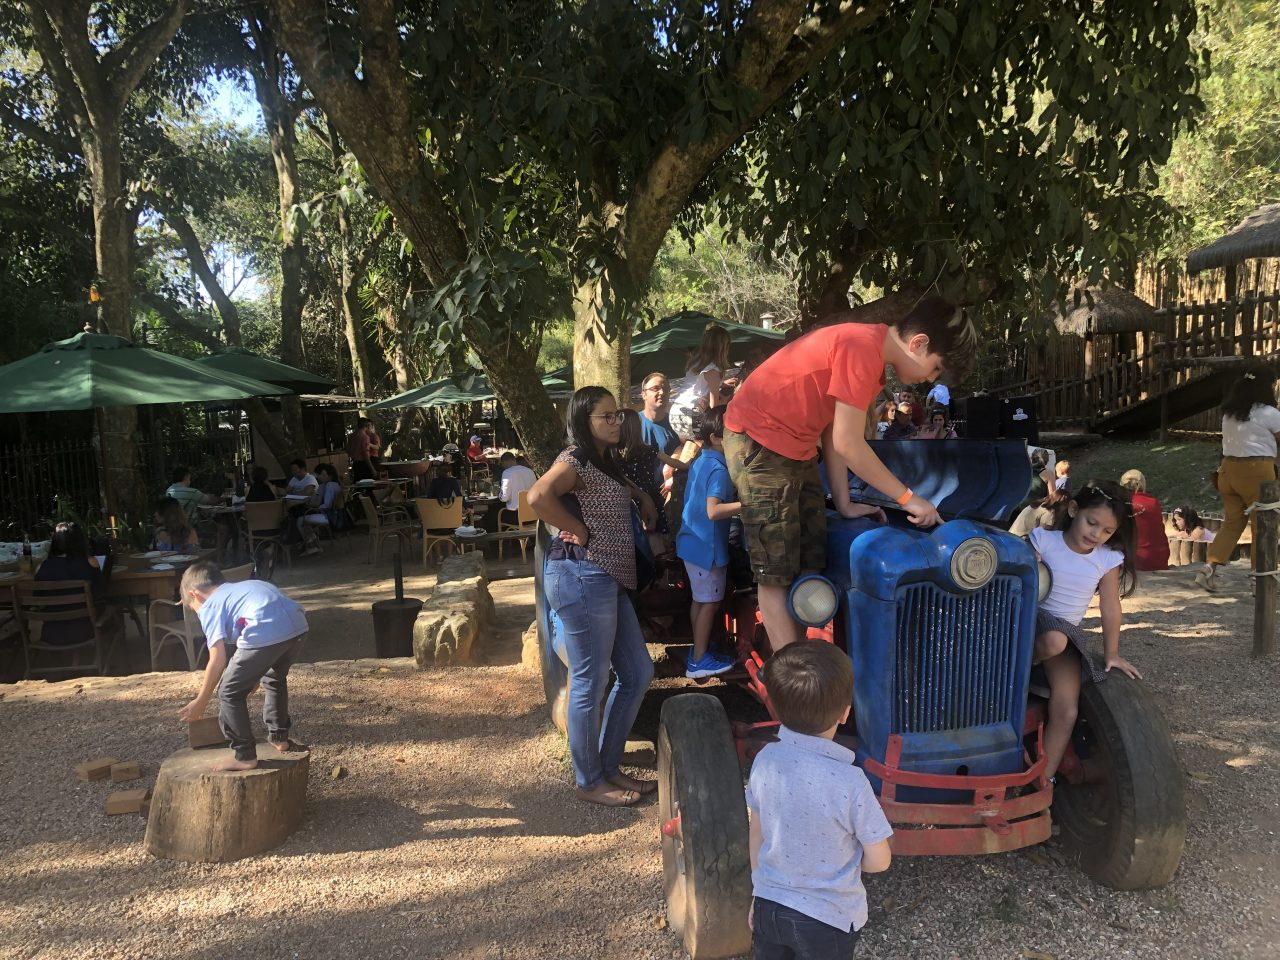 Vila Paraiso Area kids 3 Sporttechtips